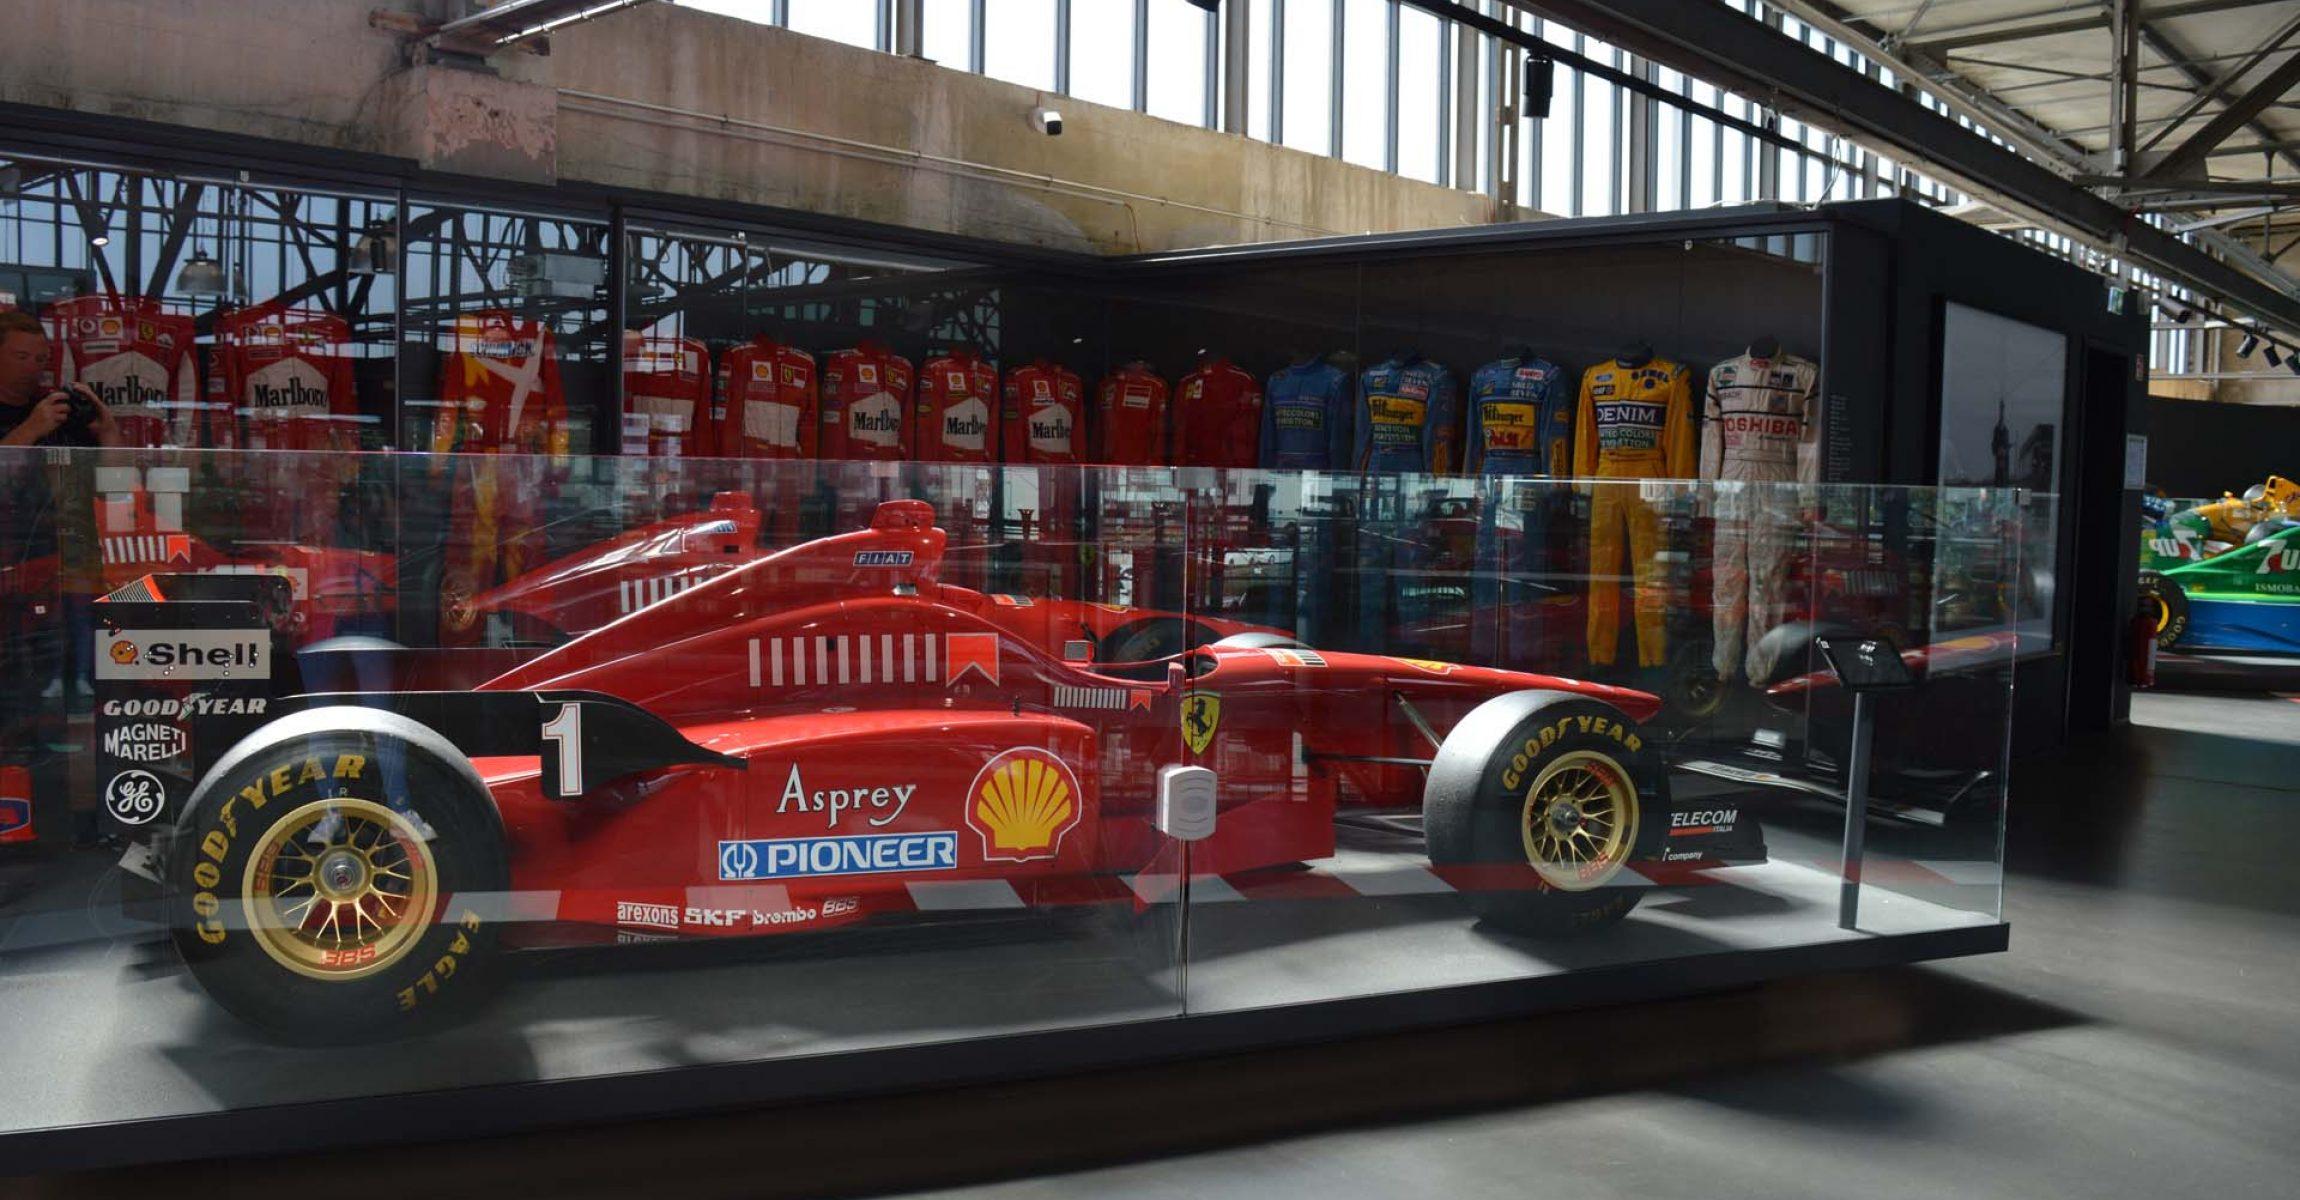 Michael Schumacher Collection, Cologne, 2019, Ferrari